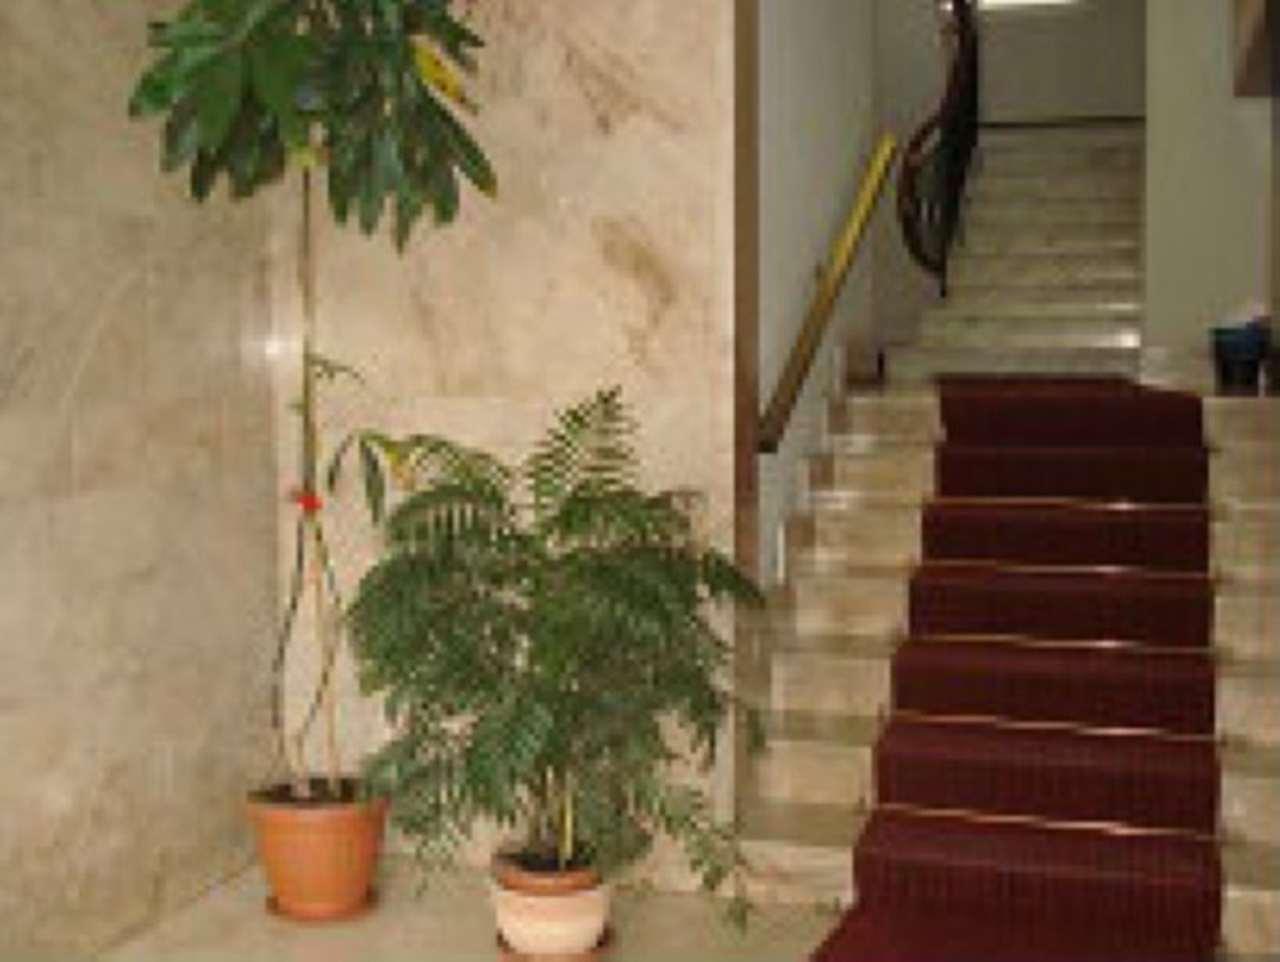 Bilocale Genova Via Onorato 3